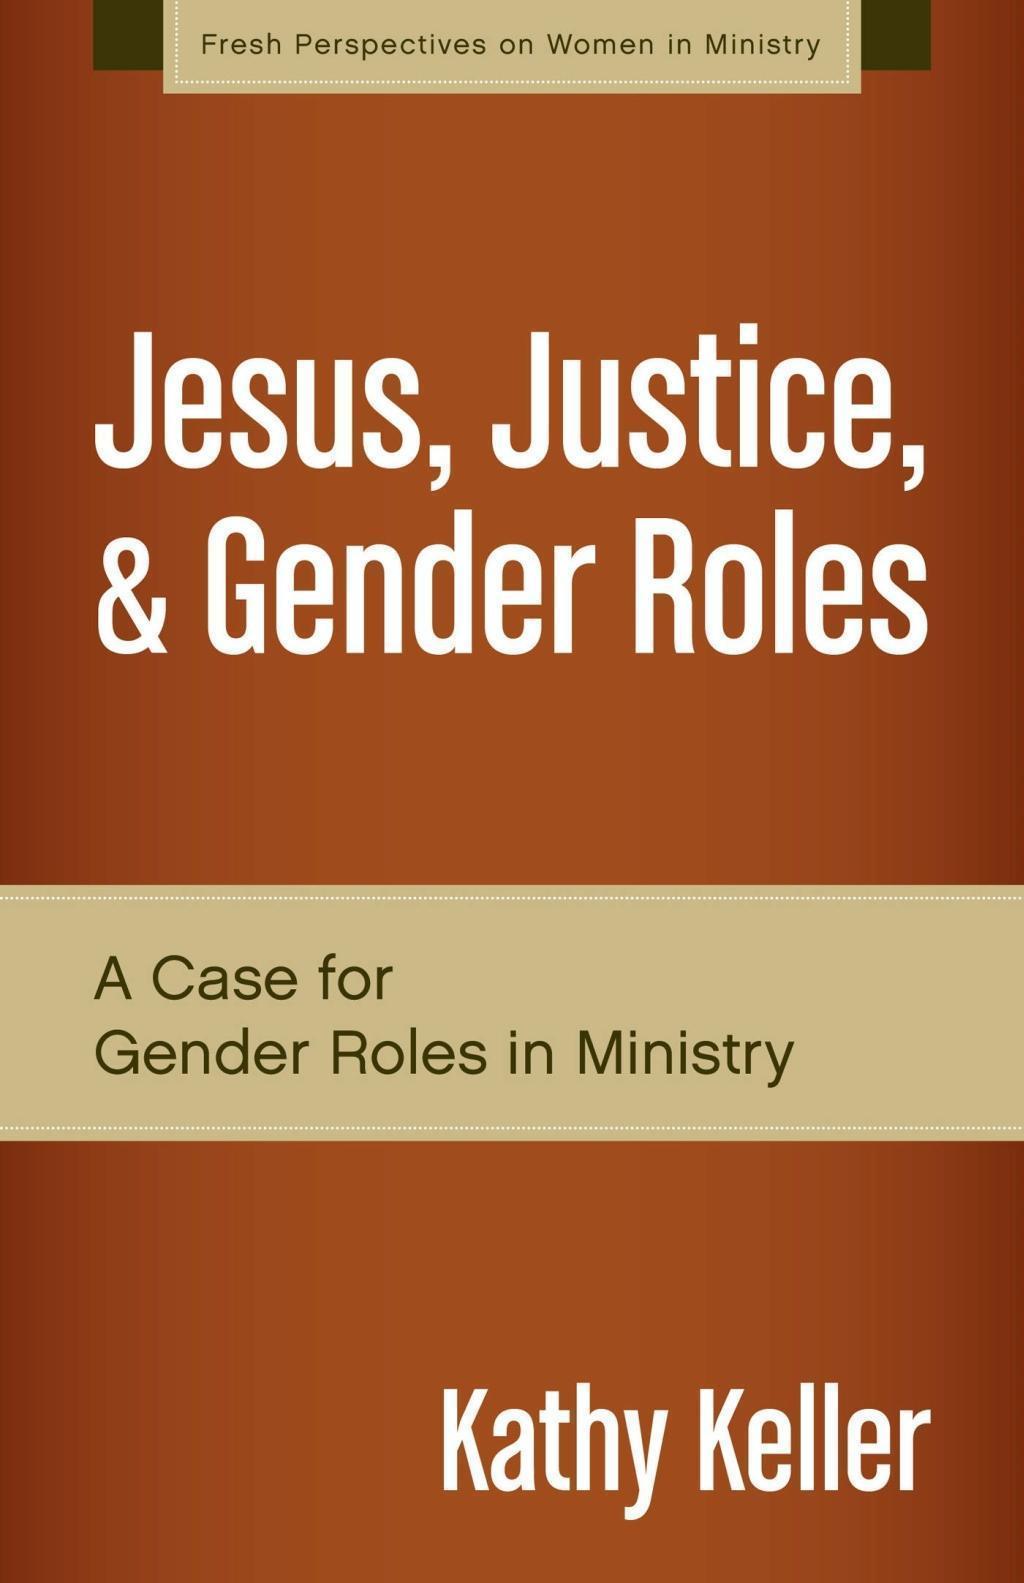 Jesus, Justice, and Gender Roles